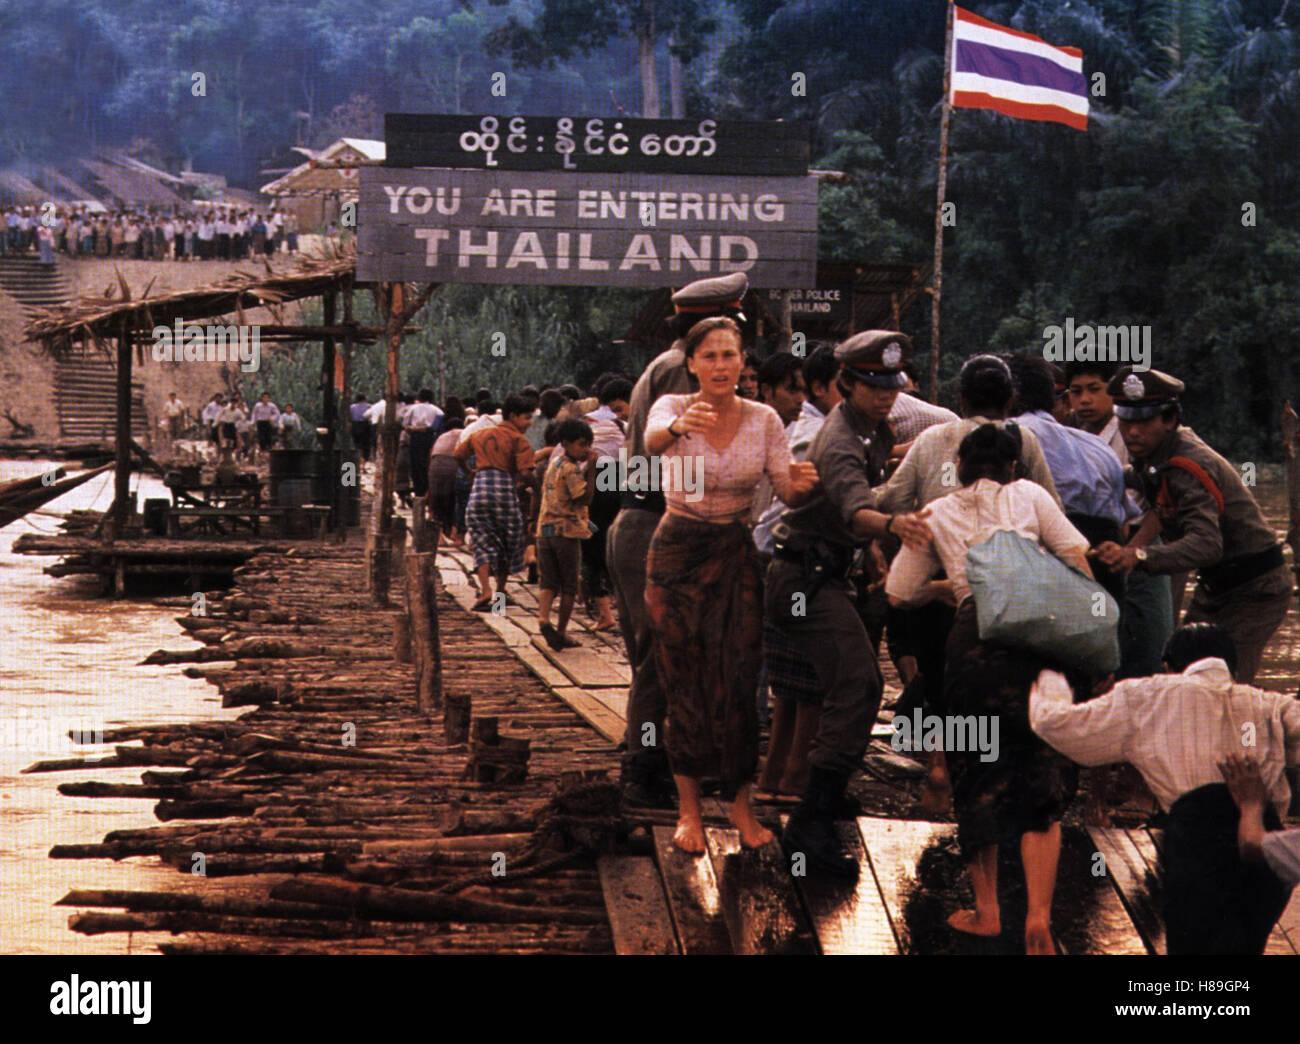 Rangoon - Im Herzen des Sturms, (BEYOND RANGOON) USA 1995, Regie: John Boorman, PATRICIA ARQUETTE, Stichwort: Grenze, Stock Photo